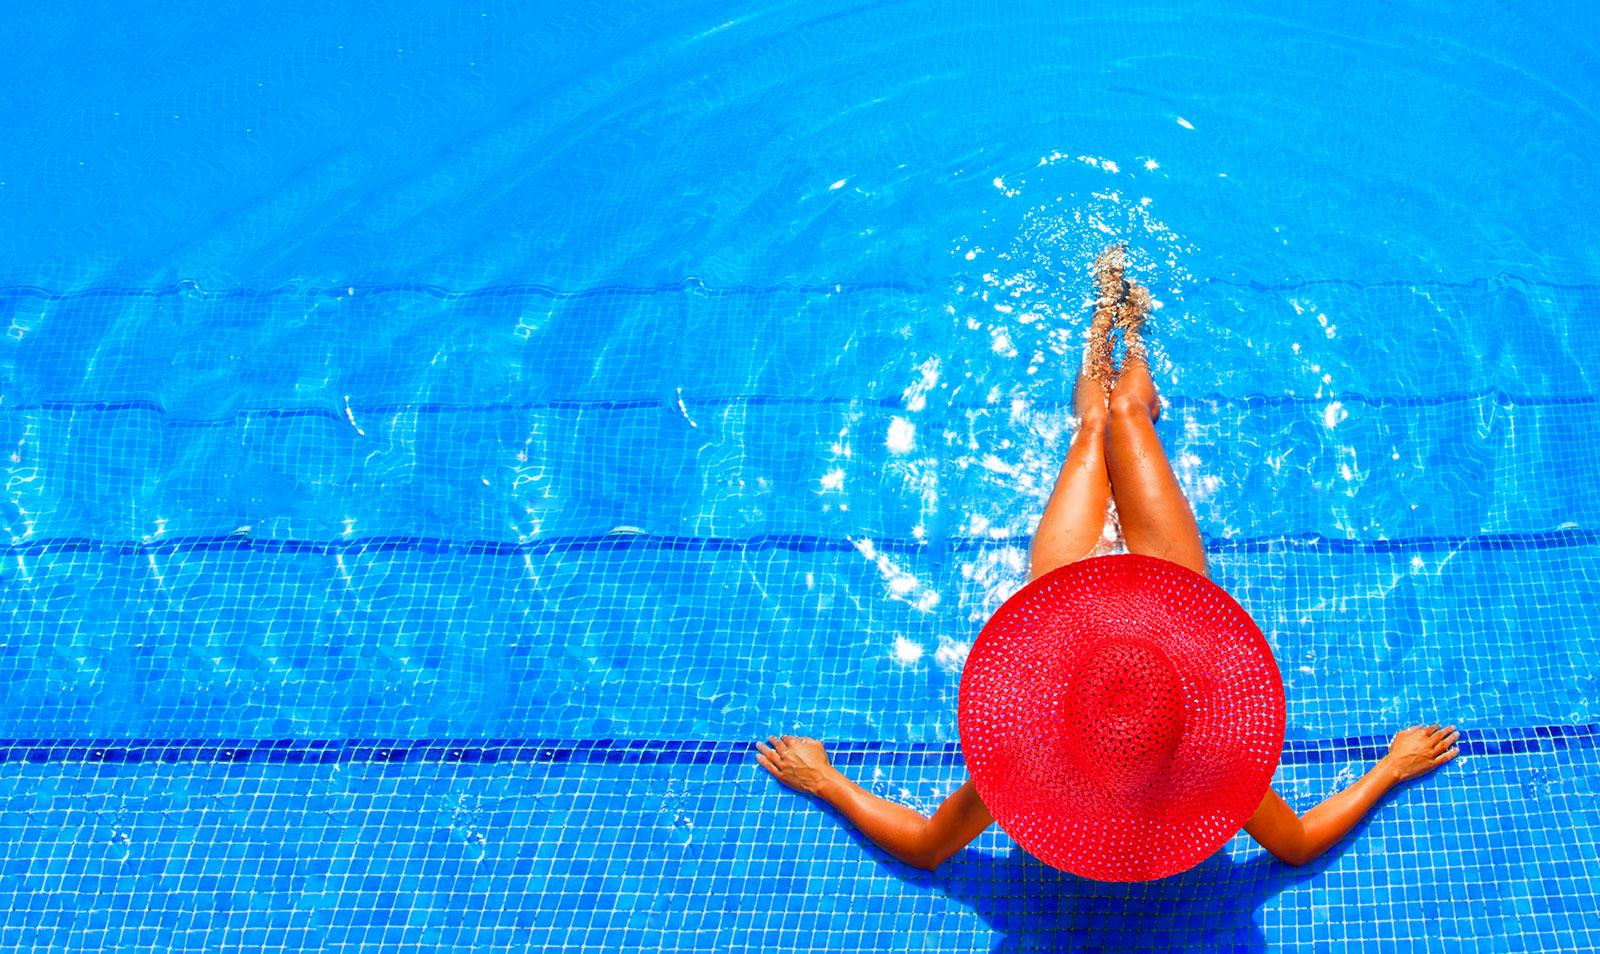 Cooling Down With Menthol Bath Items Gaijinpot